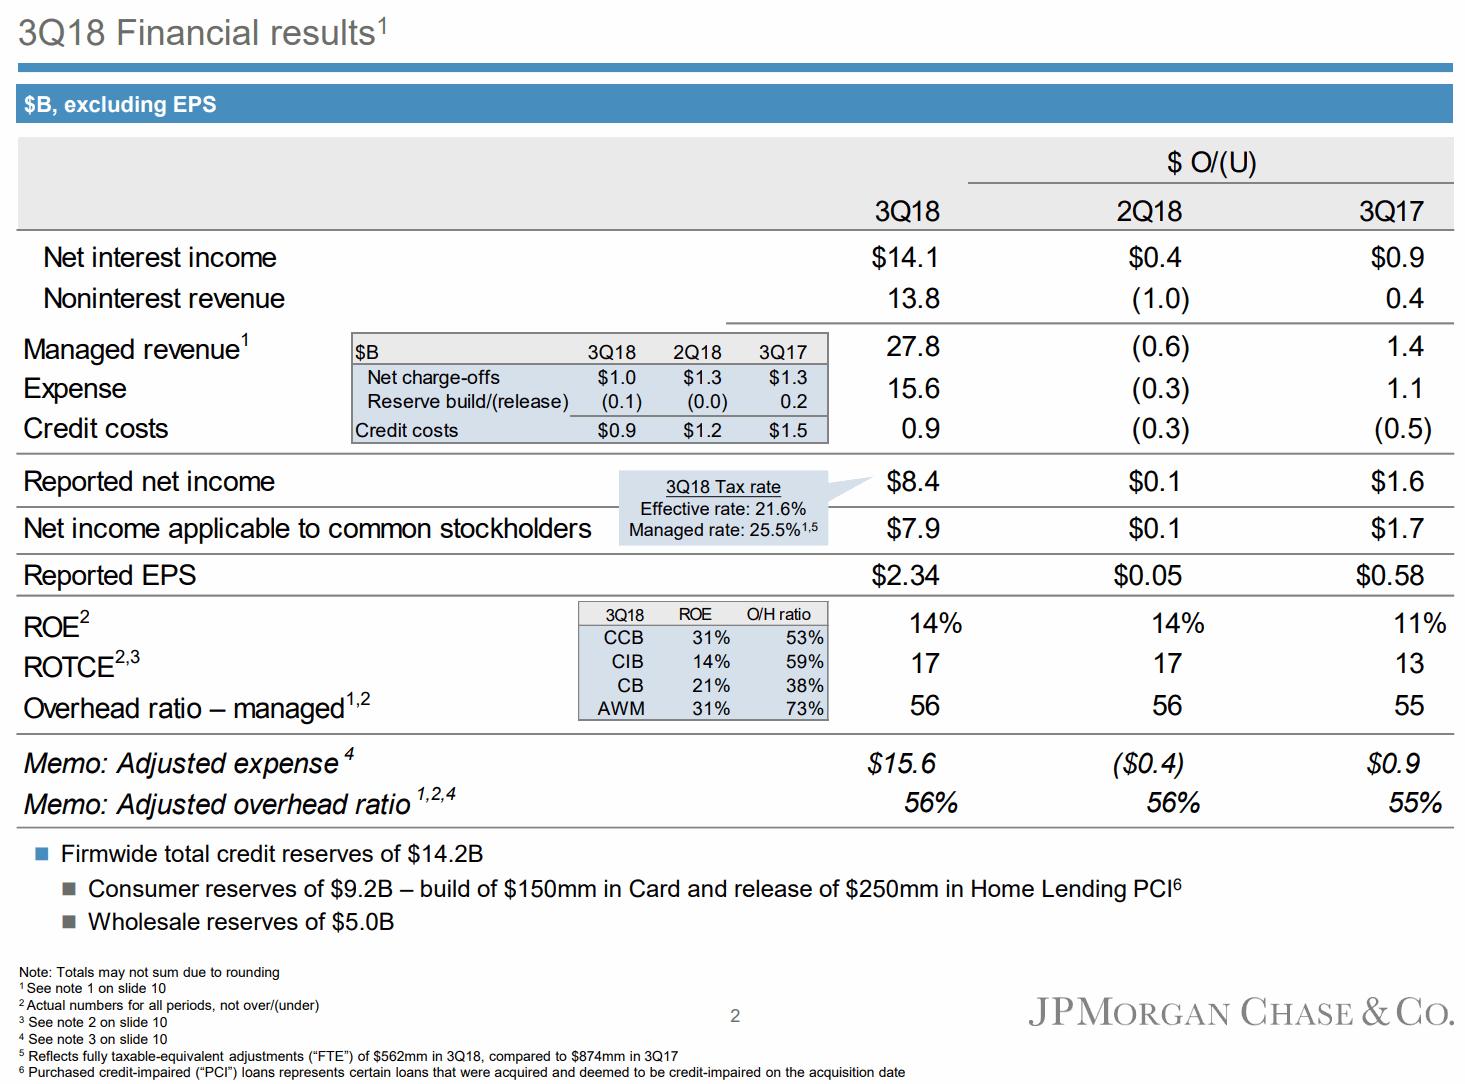 JPM-20181012